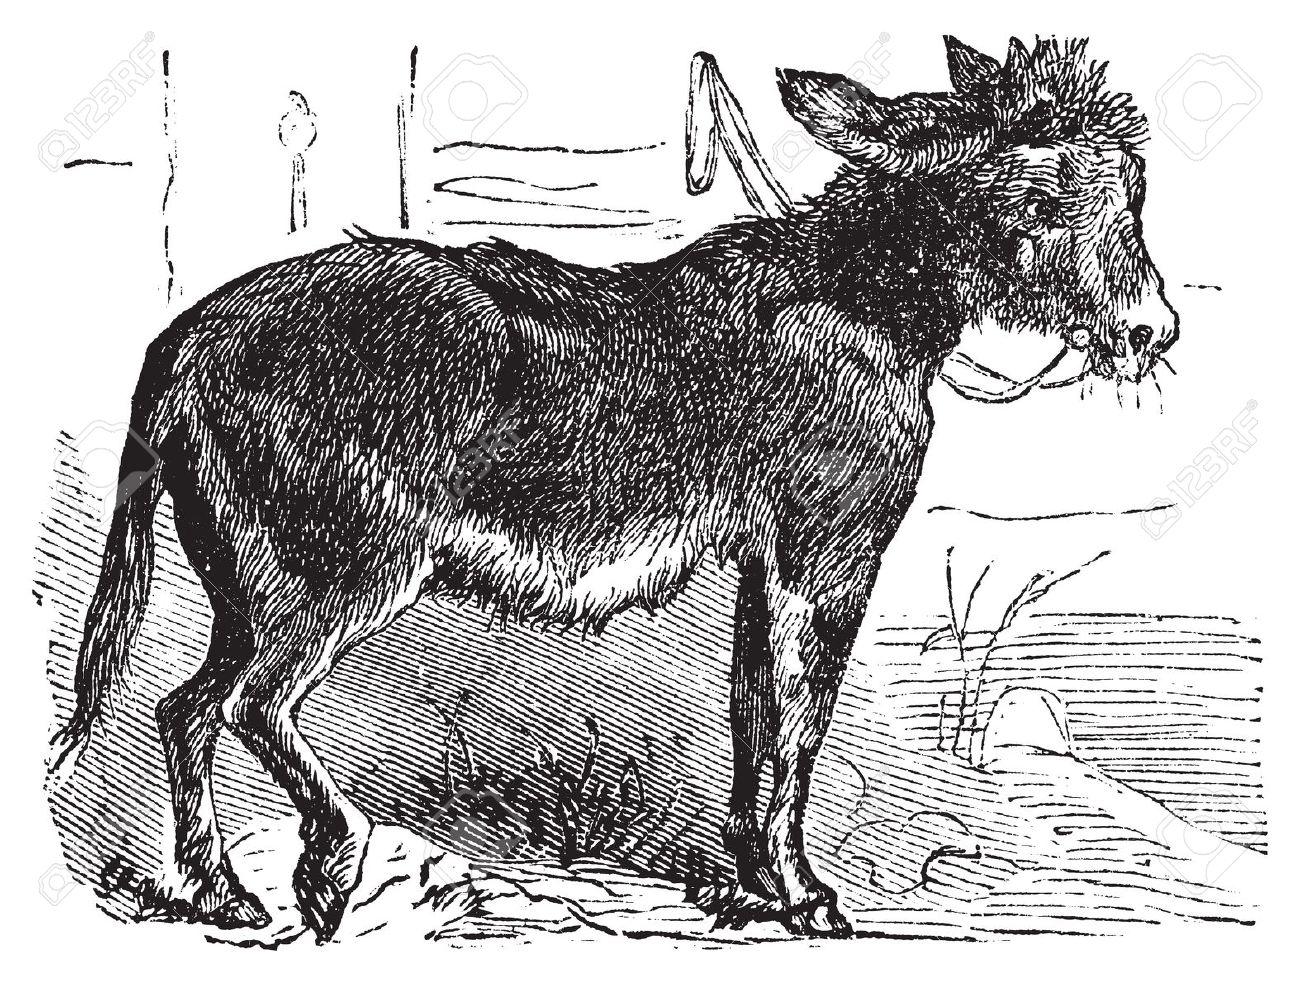 Domesticated Donkey, Ass, Asinus Vulgaris Or Equus Africanus.